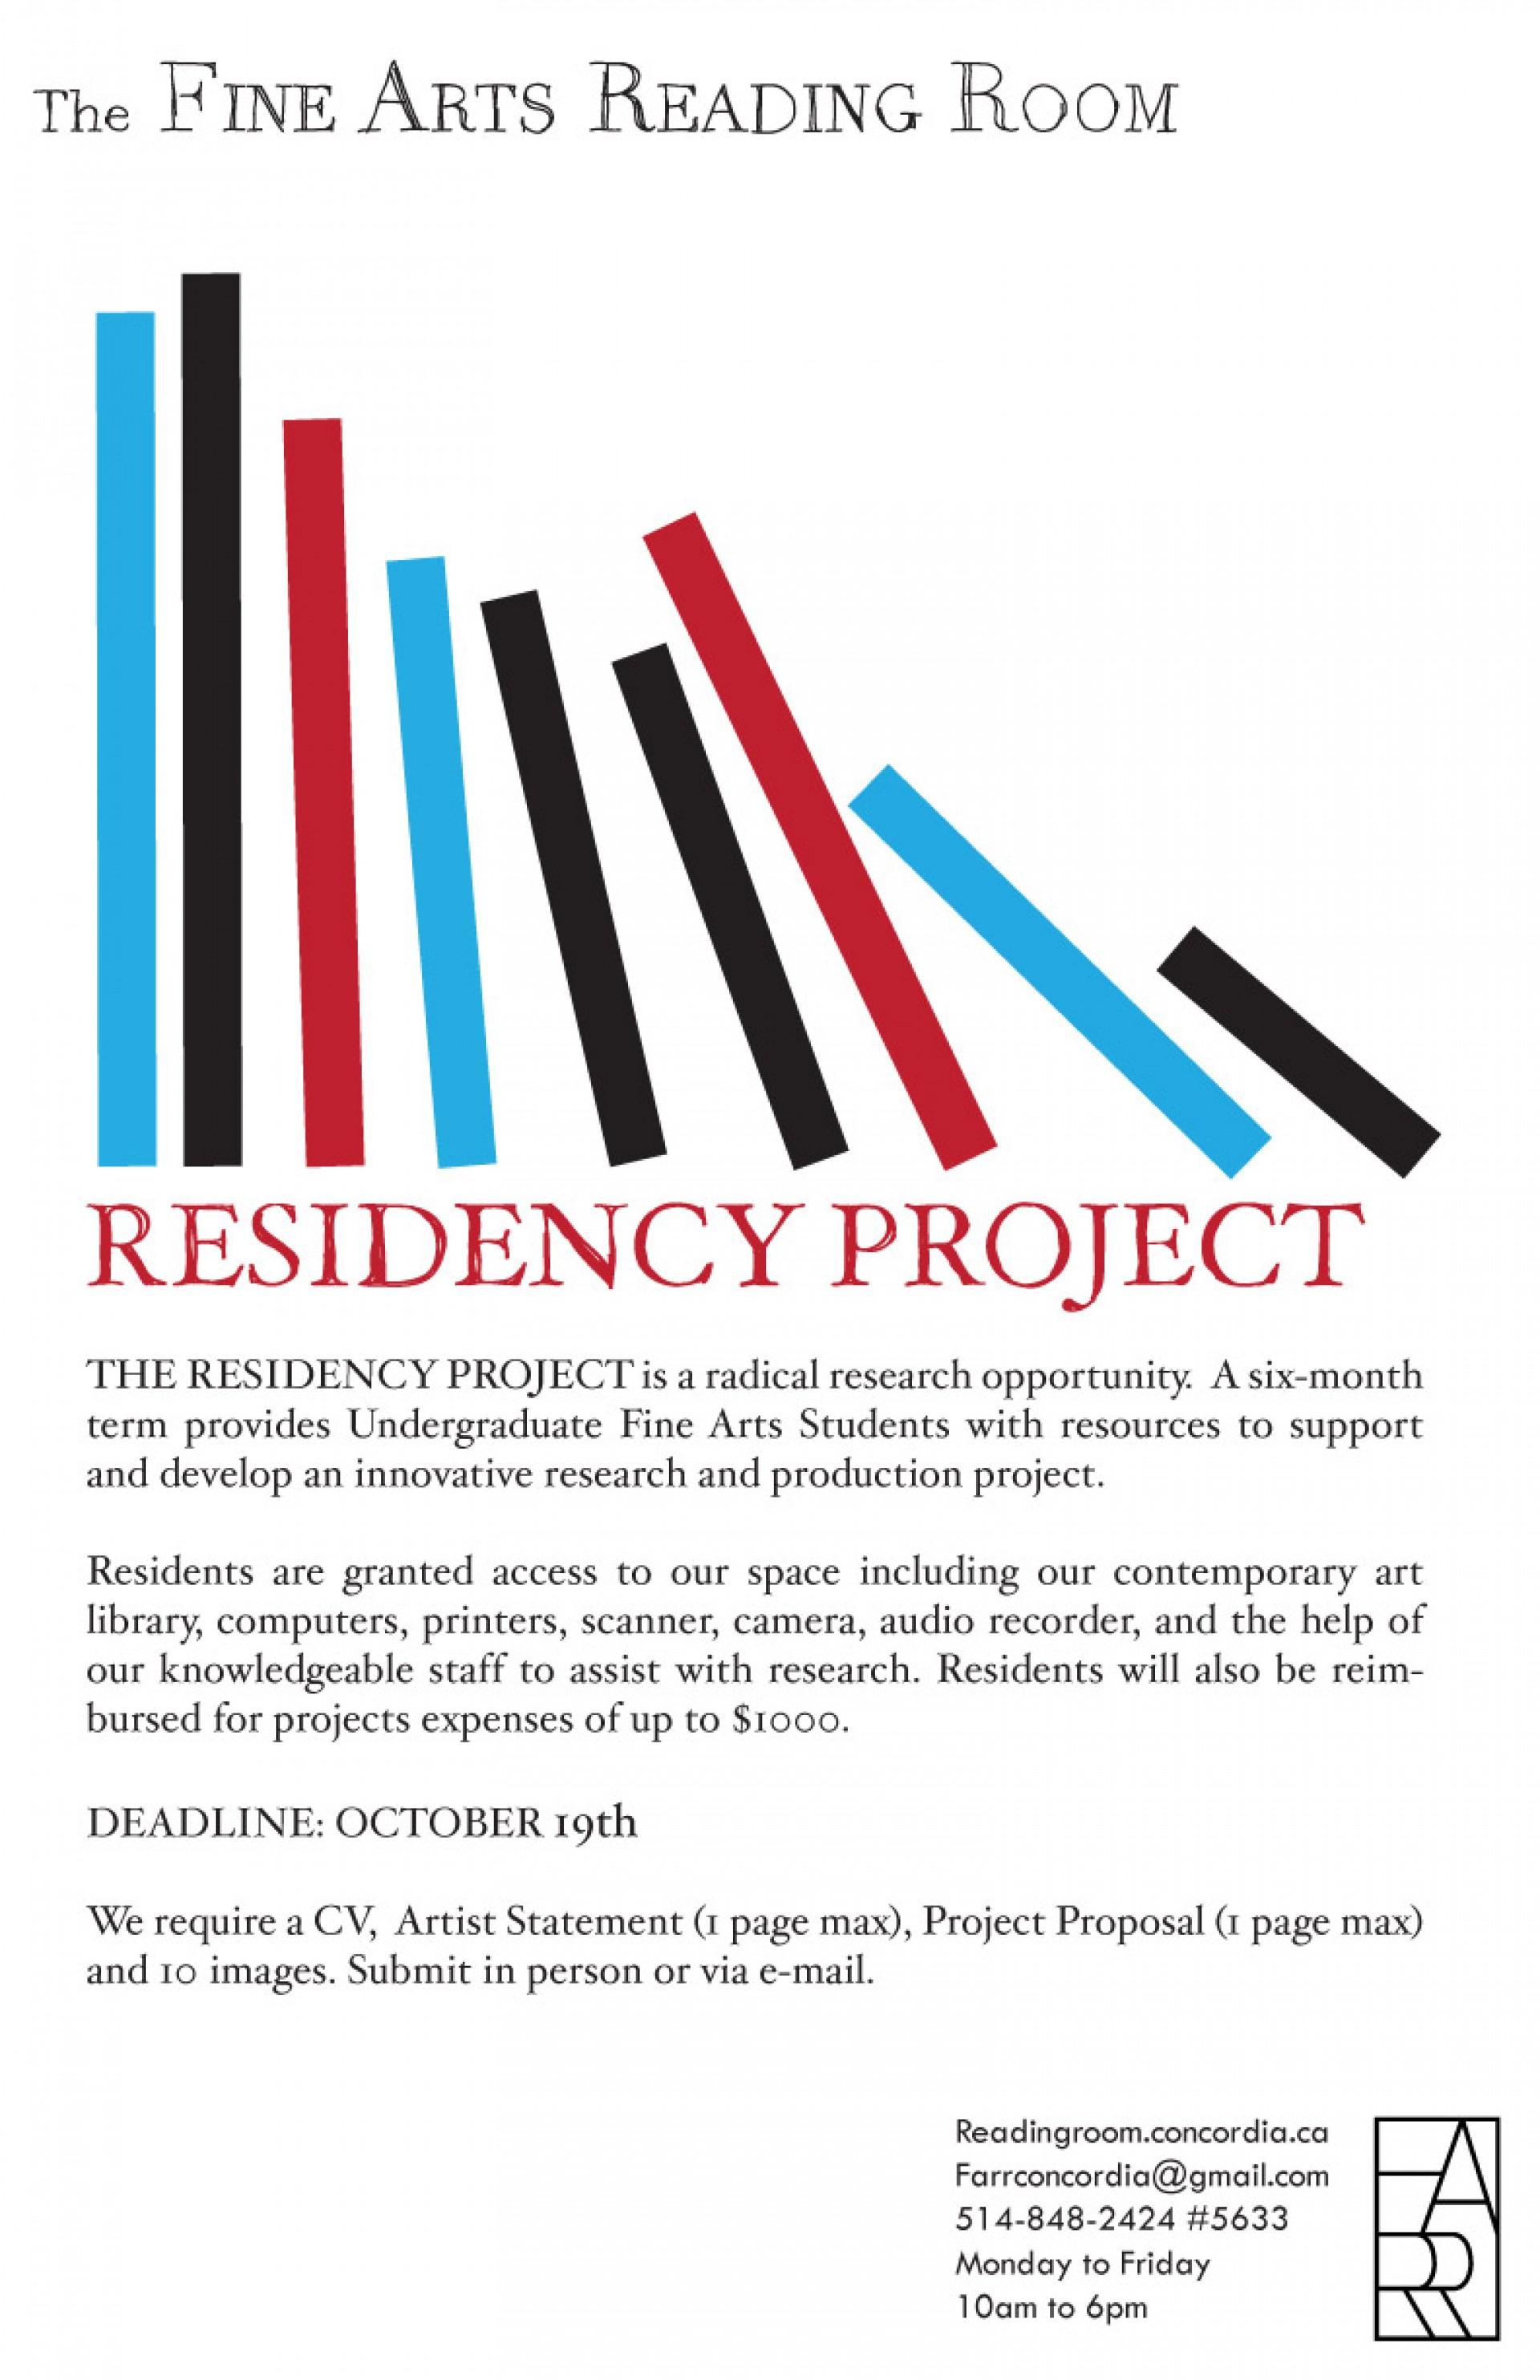 016 Farr Residency Poster Essay Example Fsu Remarkable Application Sample 1920